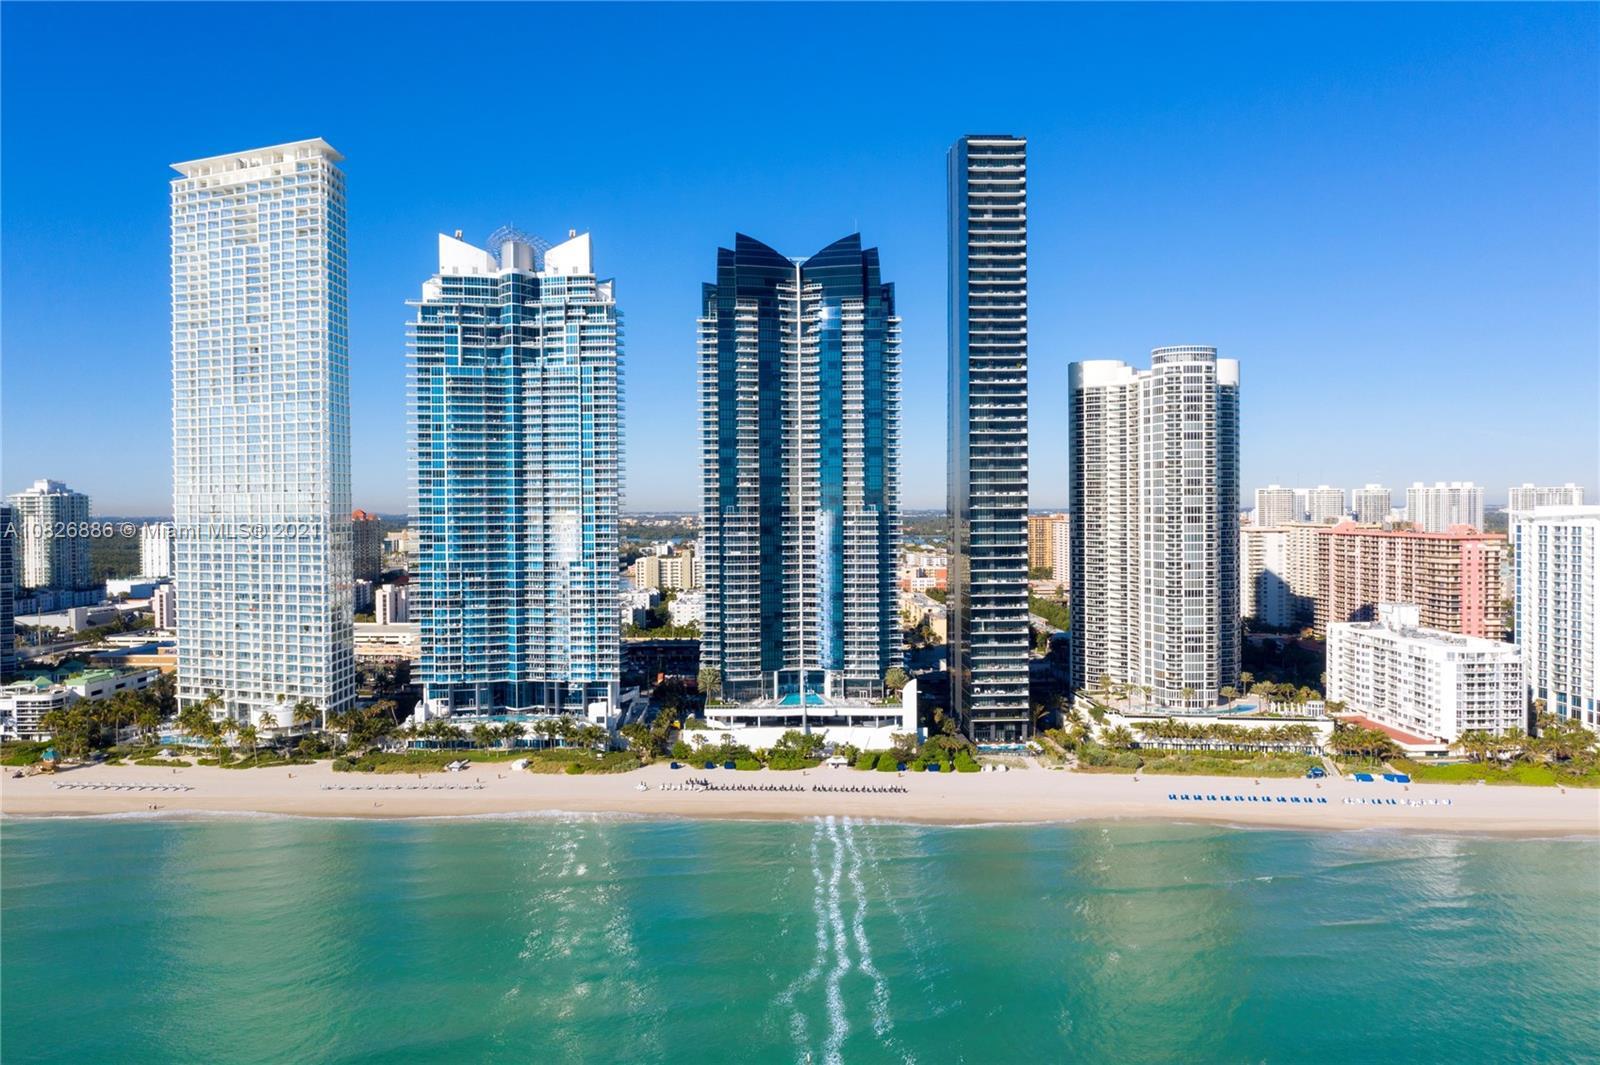 Jade Ocean #3905/3904 - 17121 Collins Ave #3905/3904, Sunny Isles Beach, FL 33160